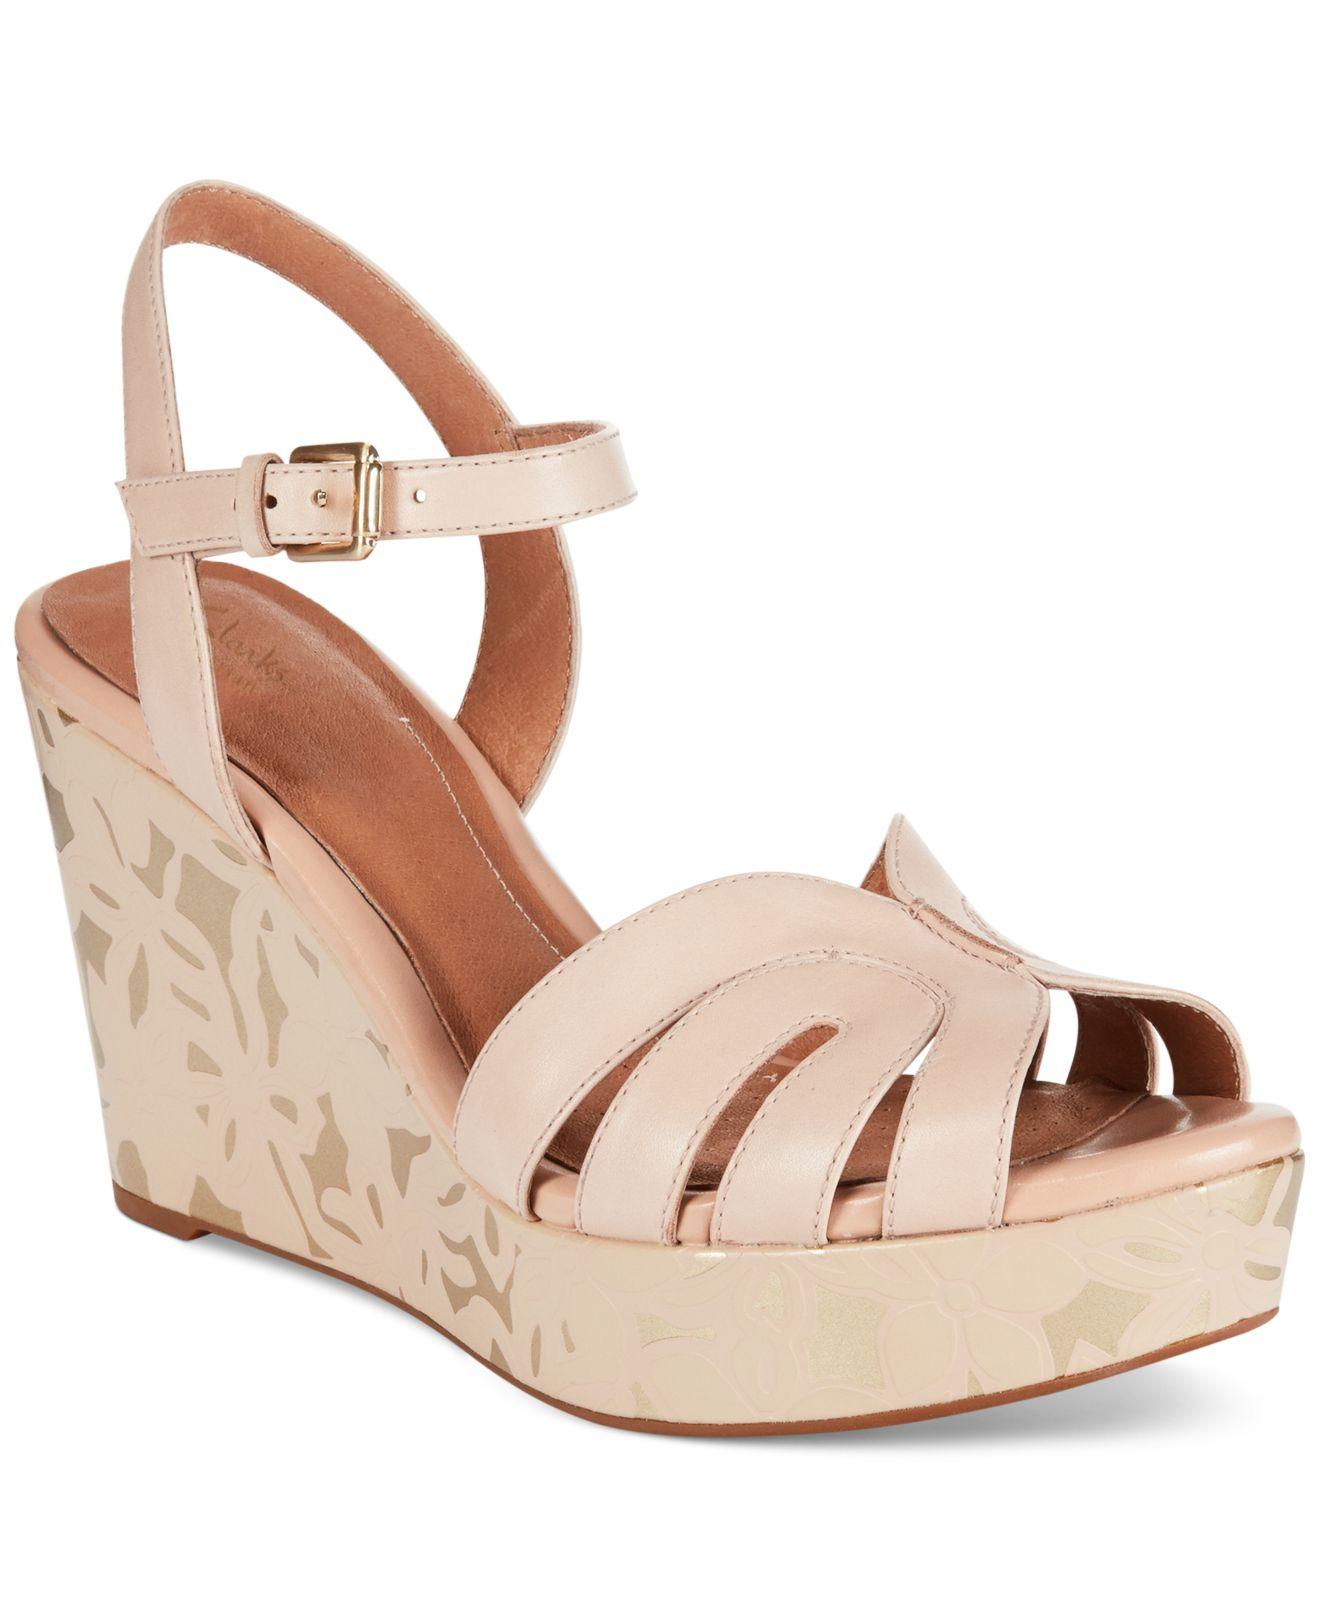 clarks artisan s amelia page platform wedge sandals